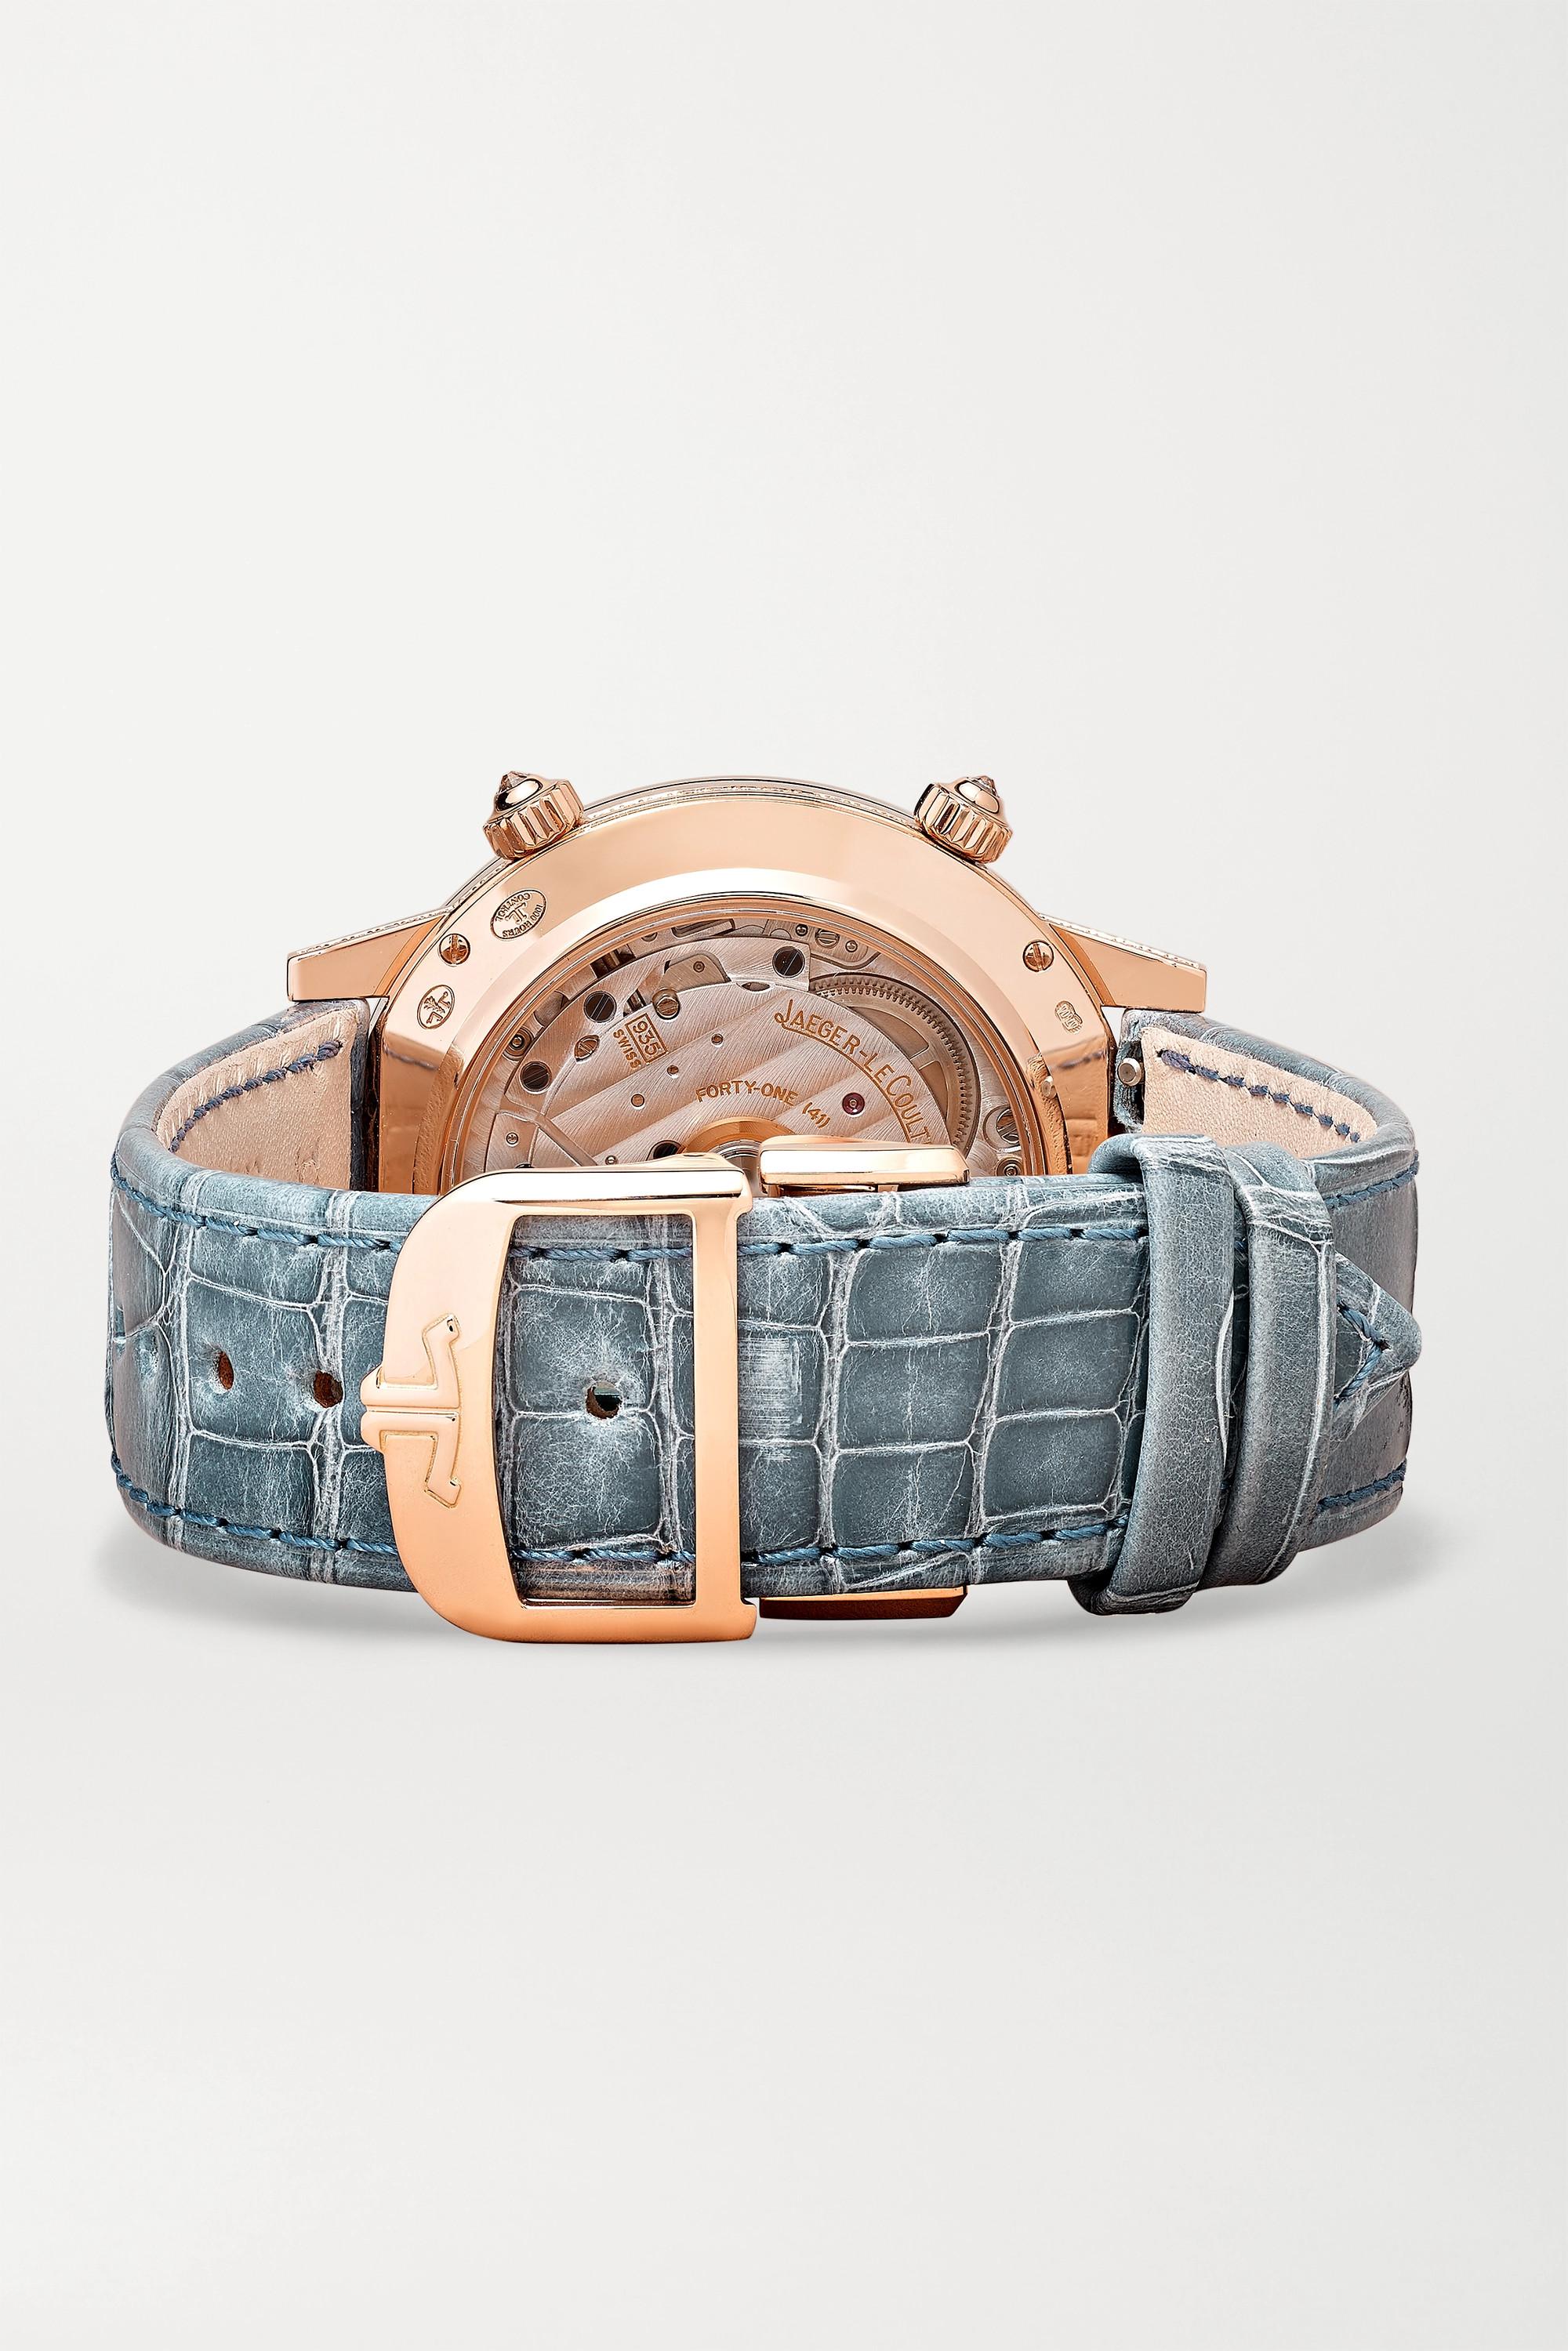 Jaeger-LeCoultre Rendez-Vous Moon Serenity Automatic 36 mm Uhr aus 18 Karat Roségold mit Diamanten und Alligatorlederarmband